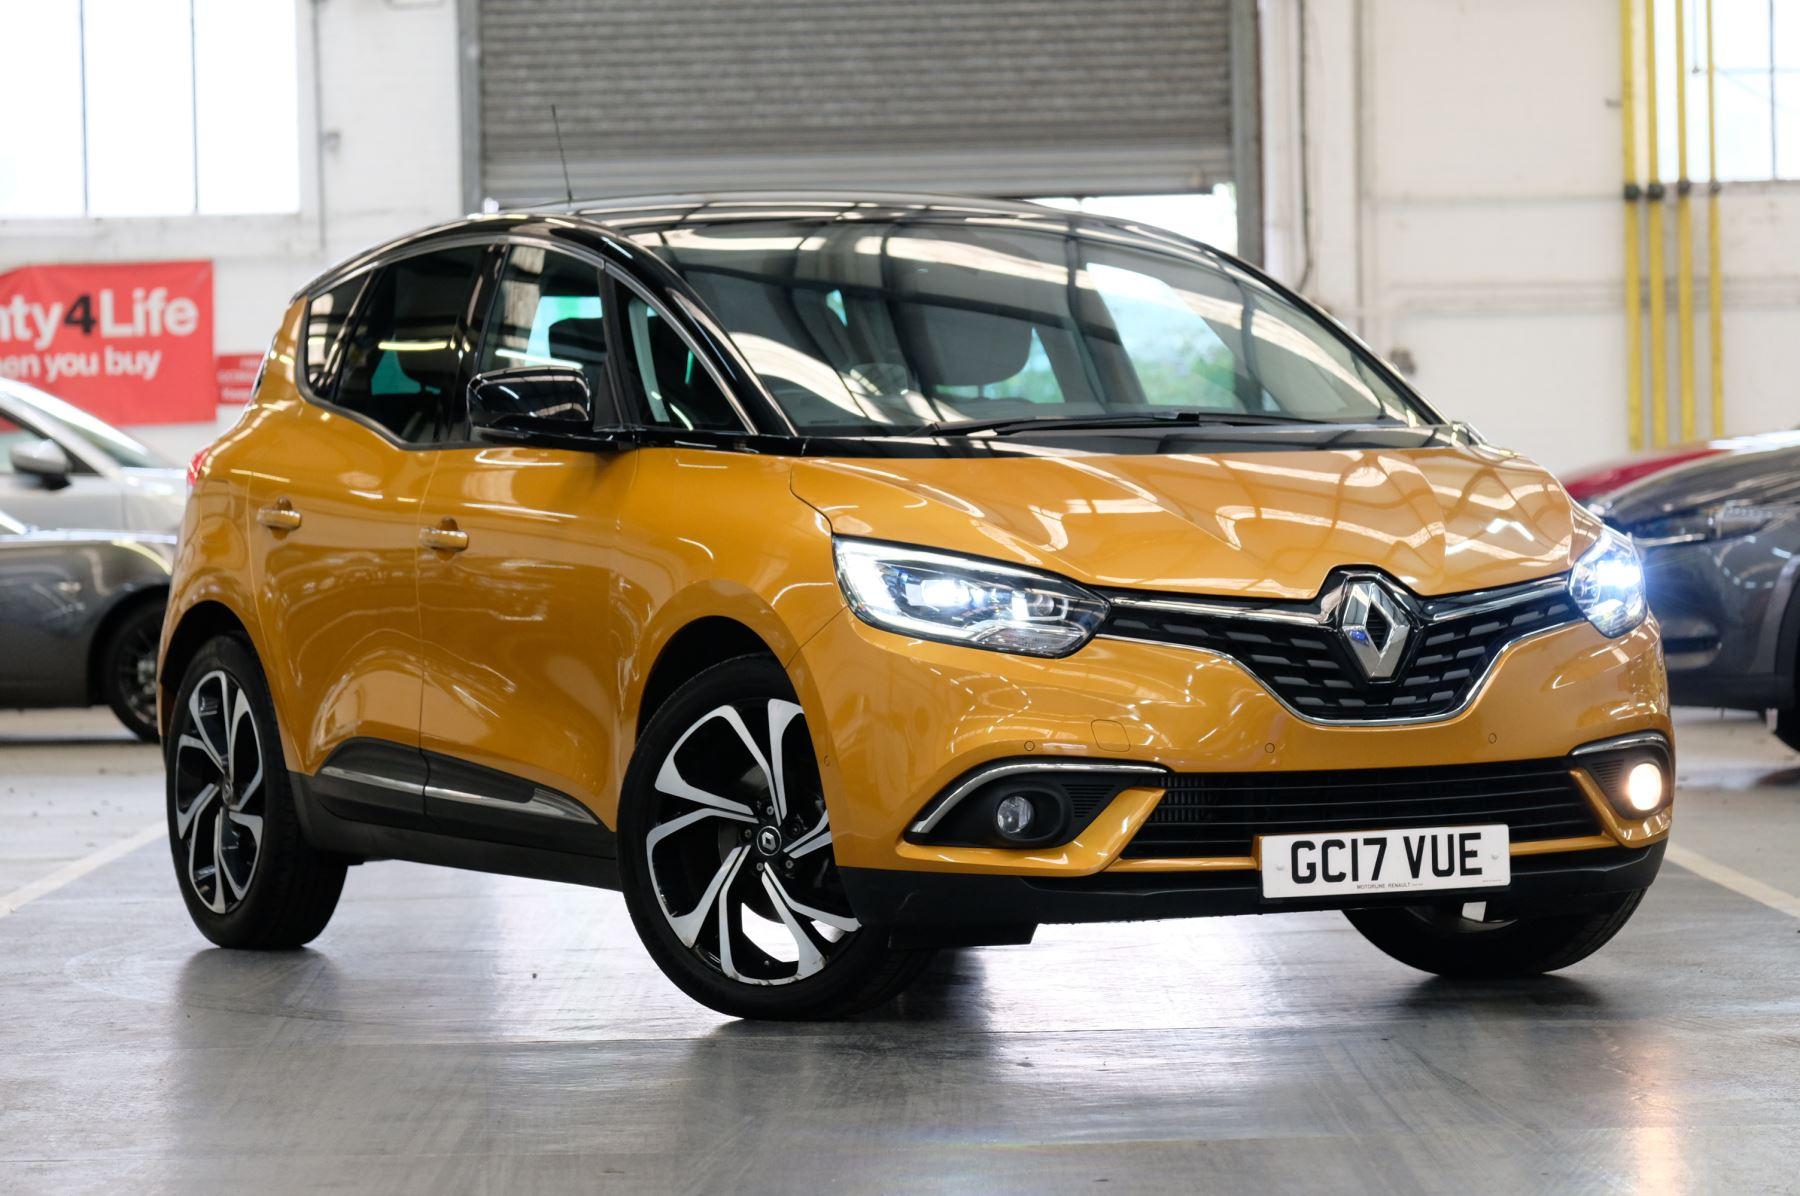 Renault Scenic 1.6 dCi Signature Nav 5dr image 1